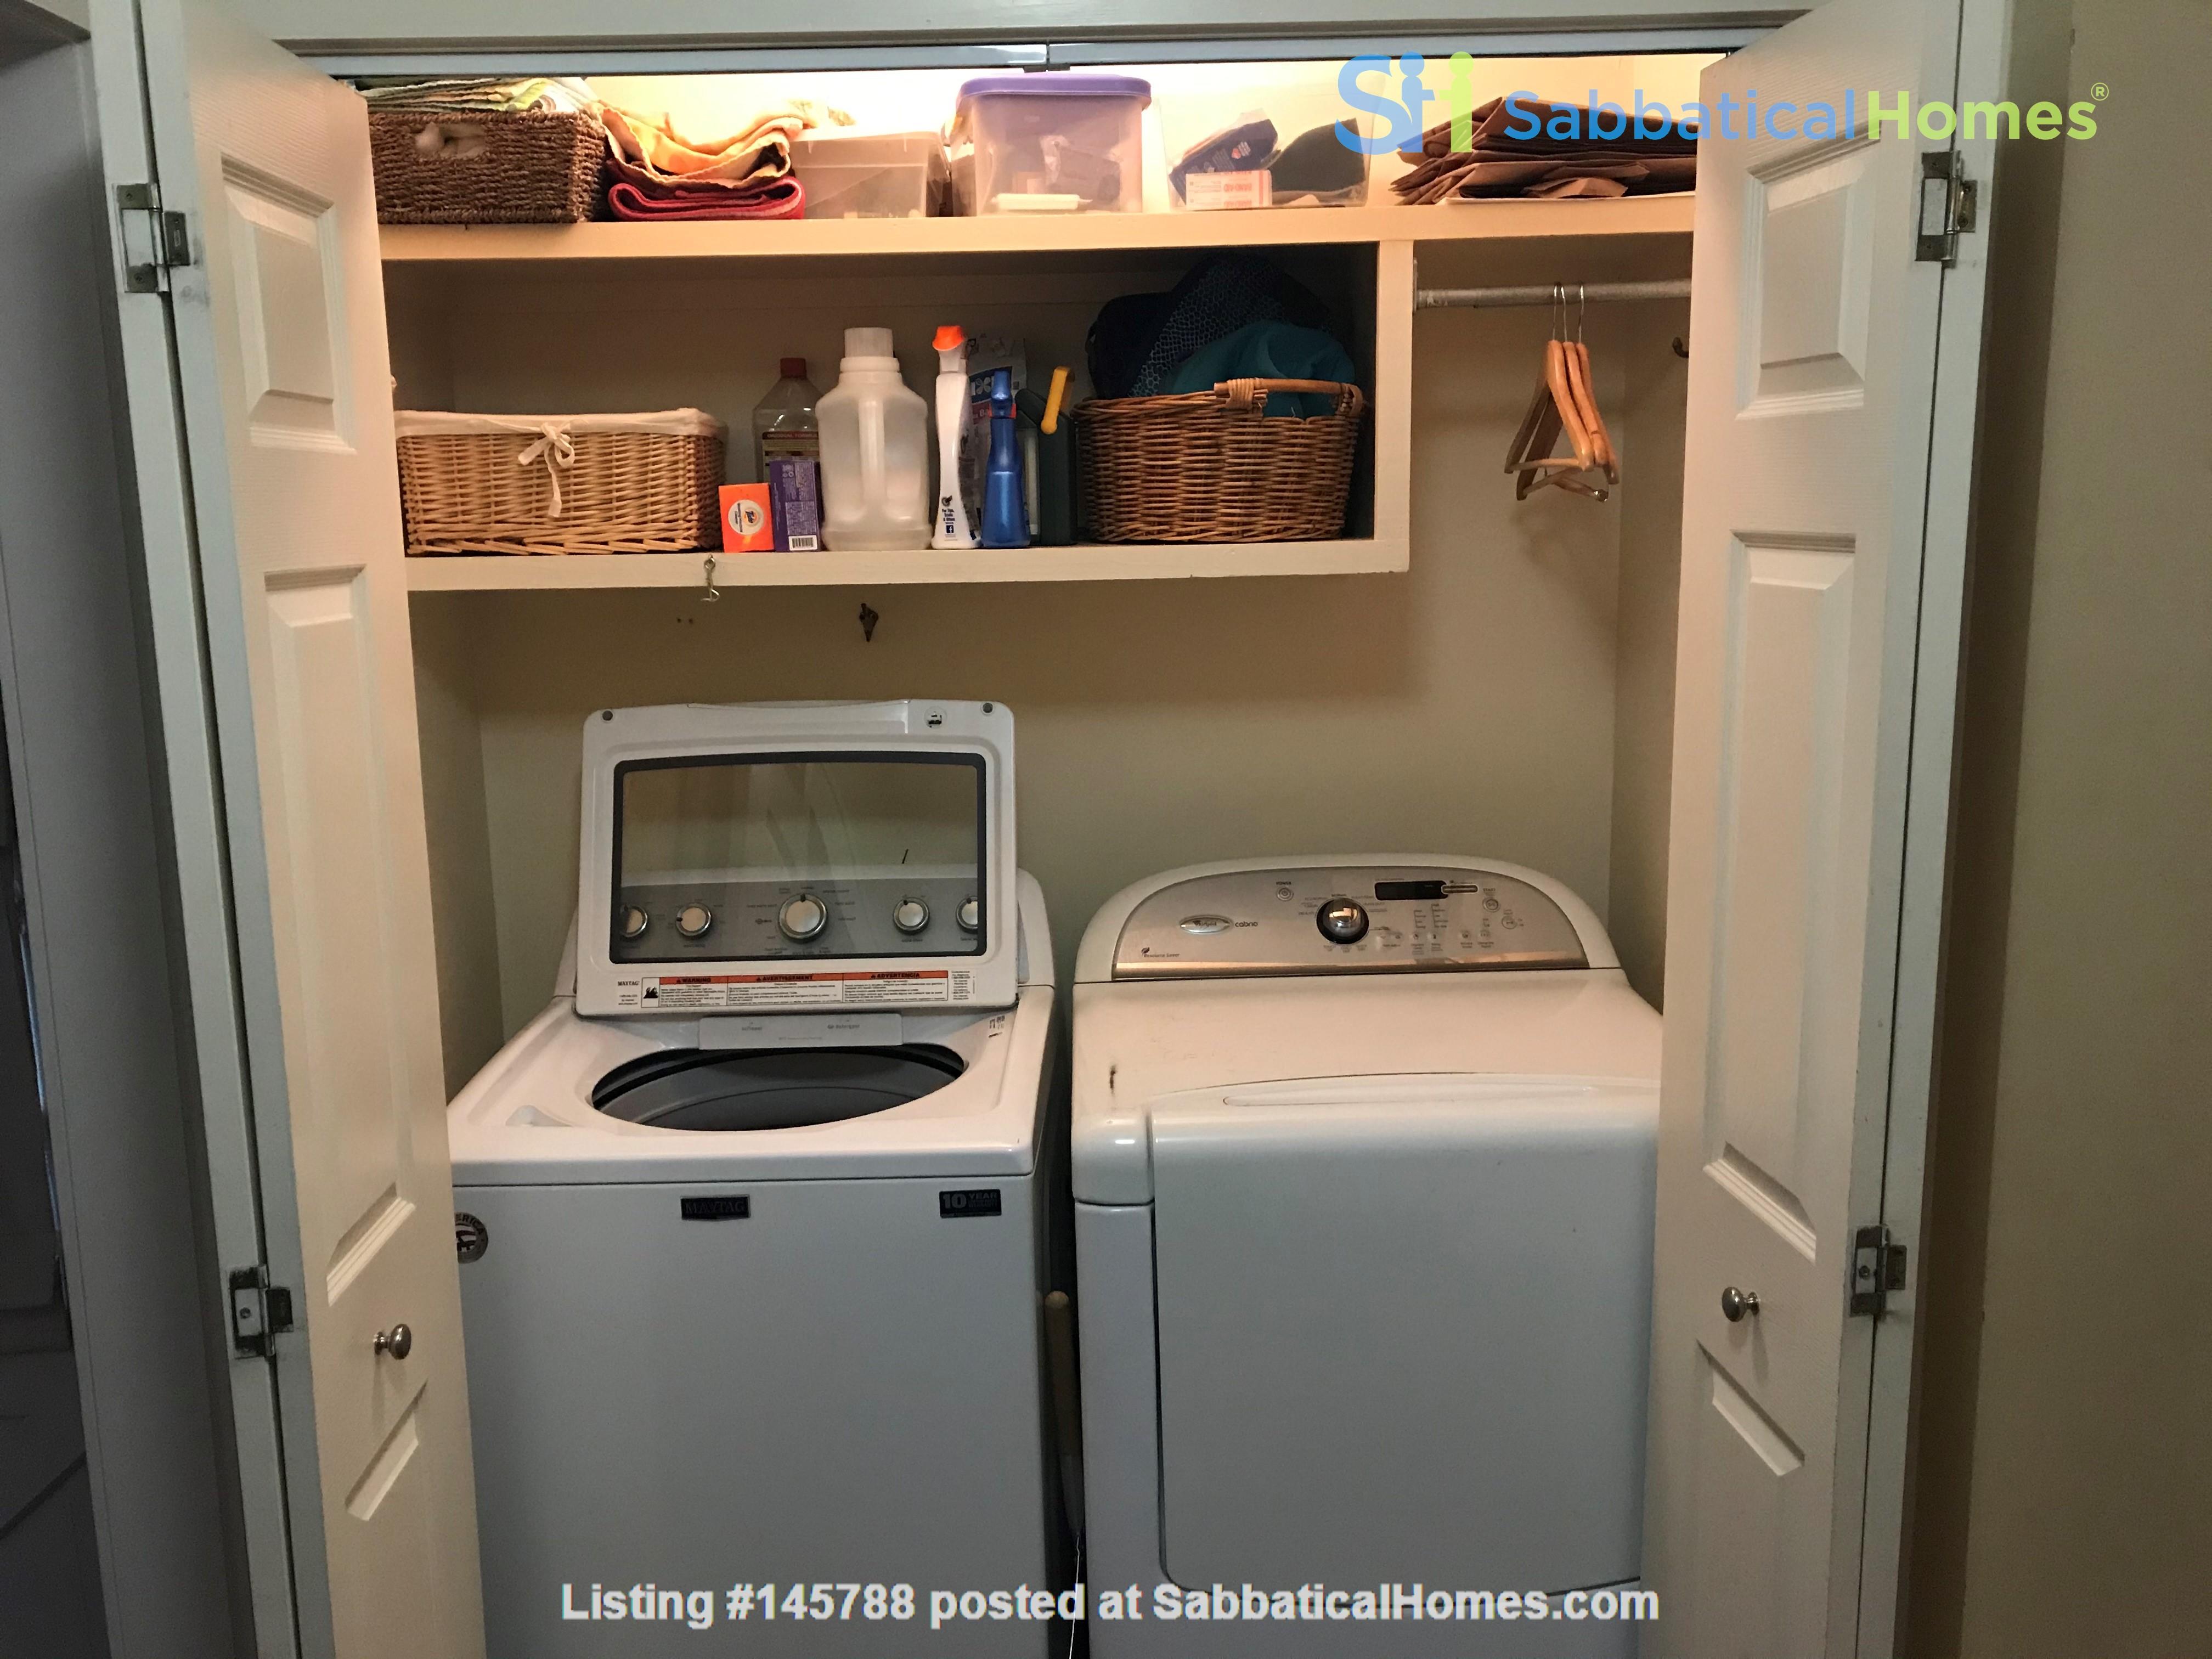 Charming 3 bedroom bungalow in Baton Rouge, Louisiana near LSU Home Rental in Baton Rouge 6